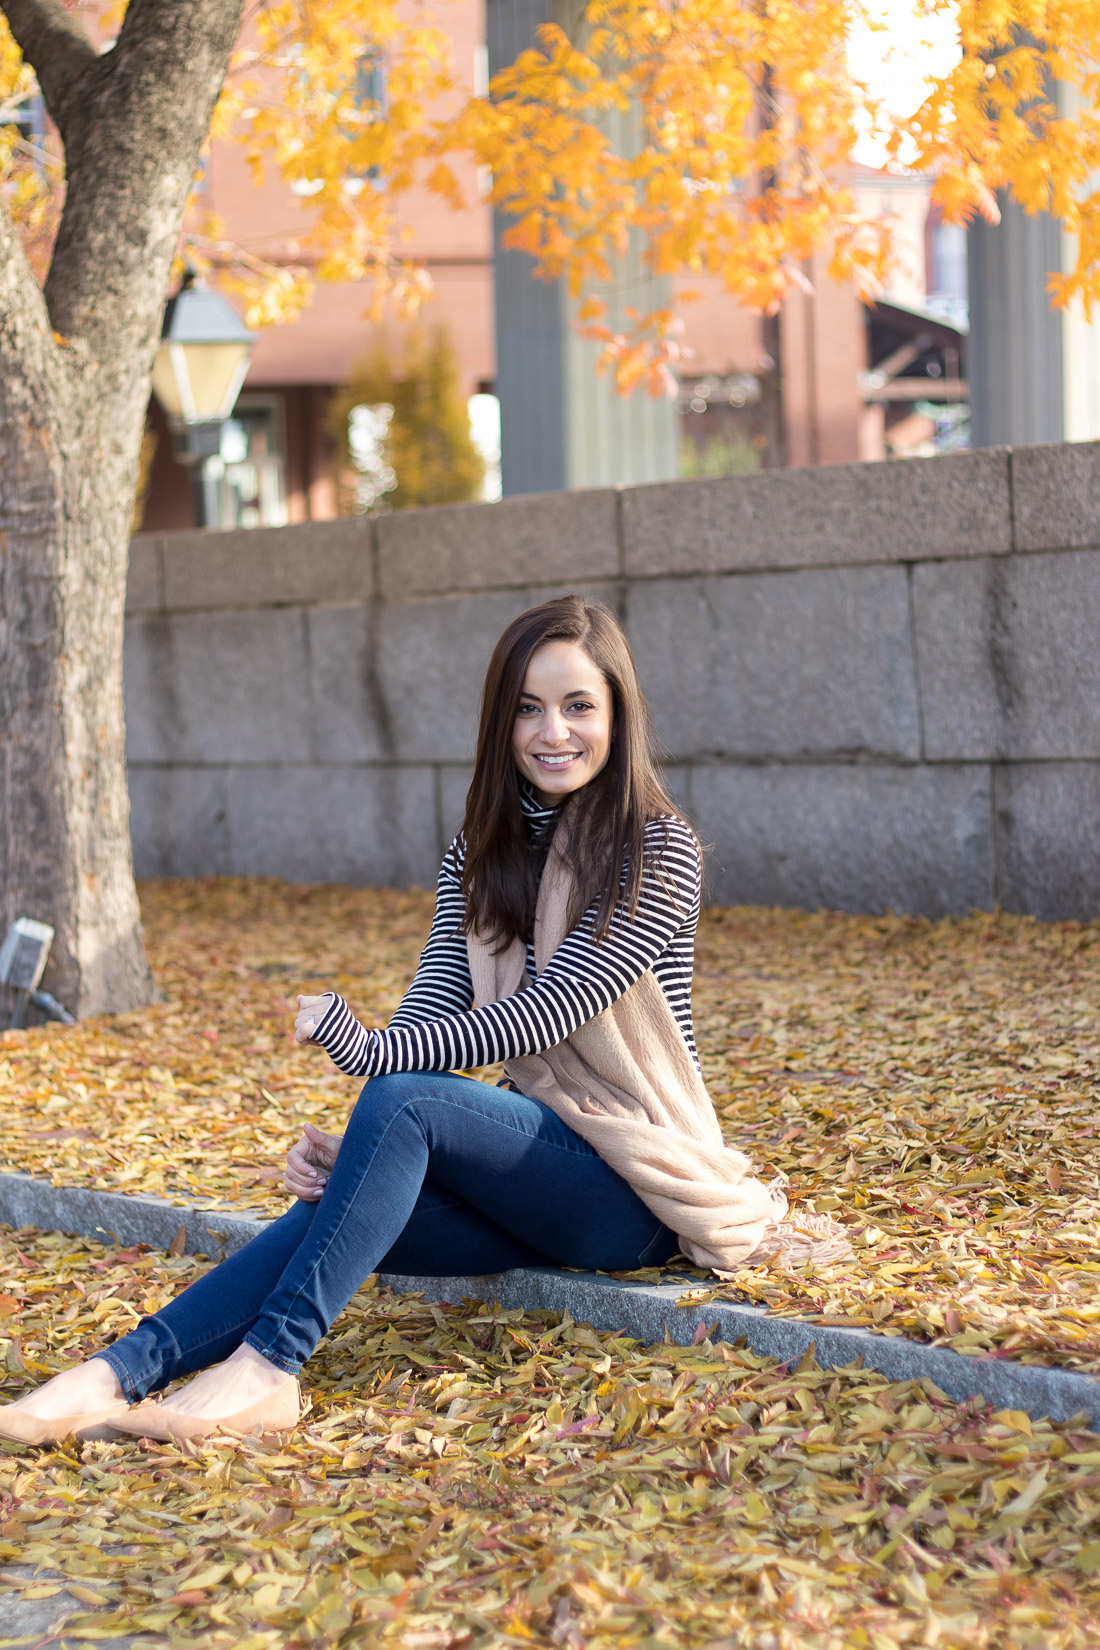 Brooke of Pumps & Push-Ups, petite style blogger